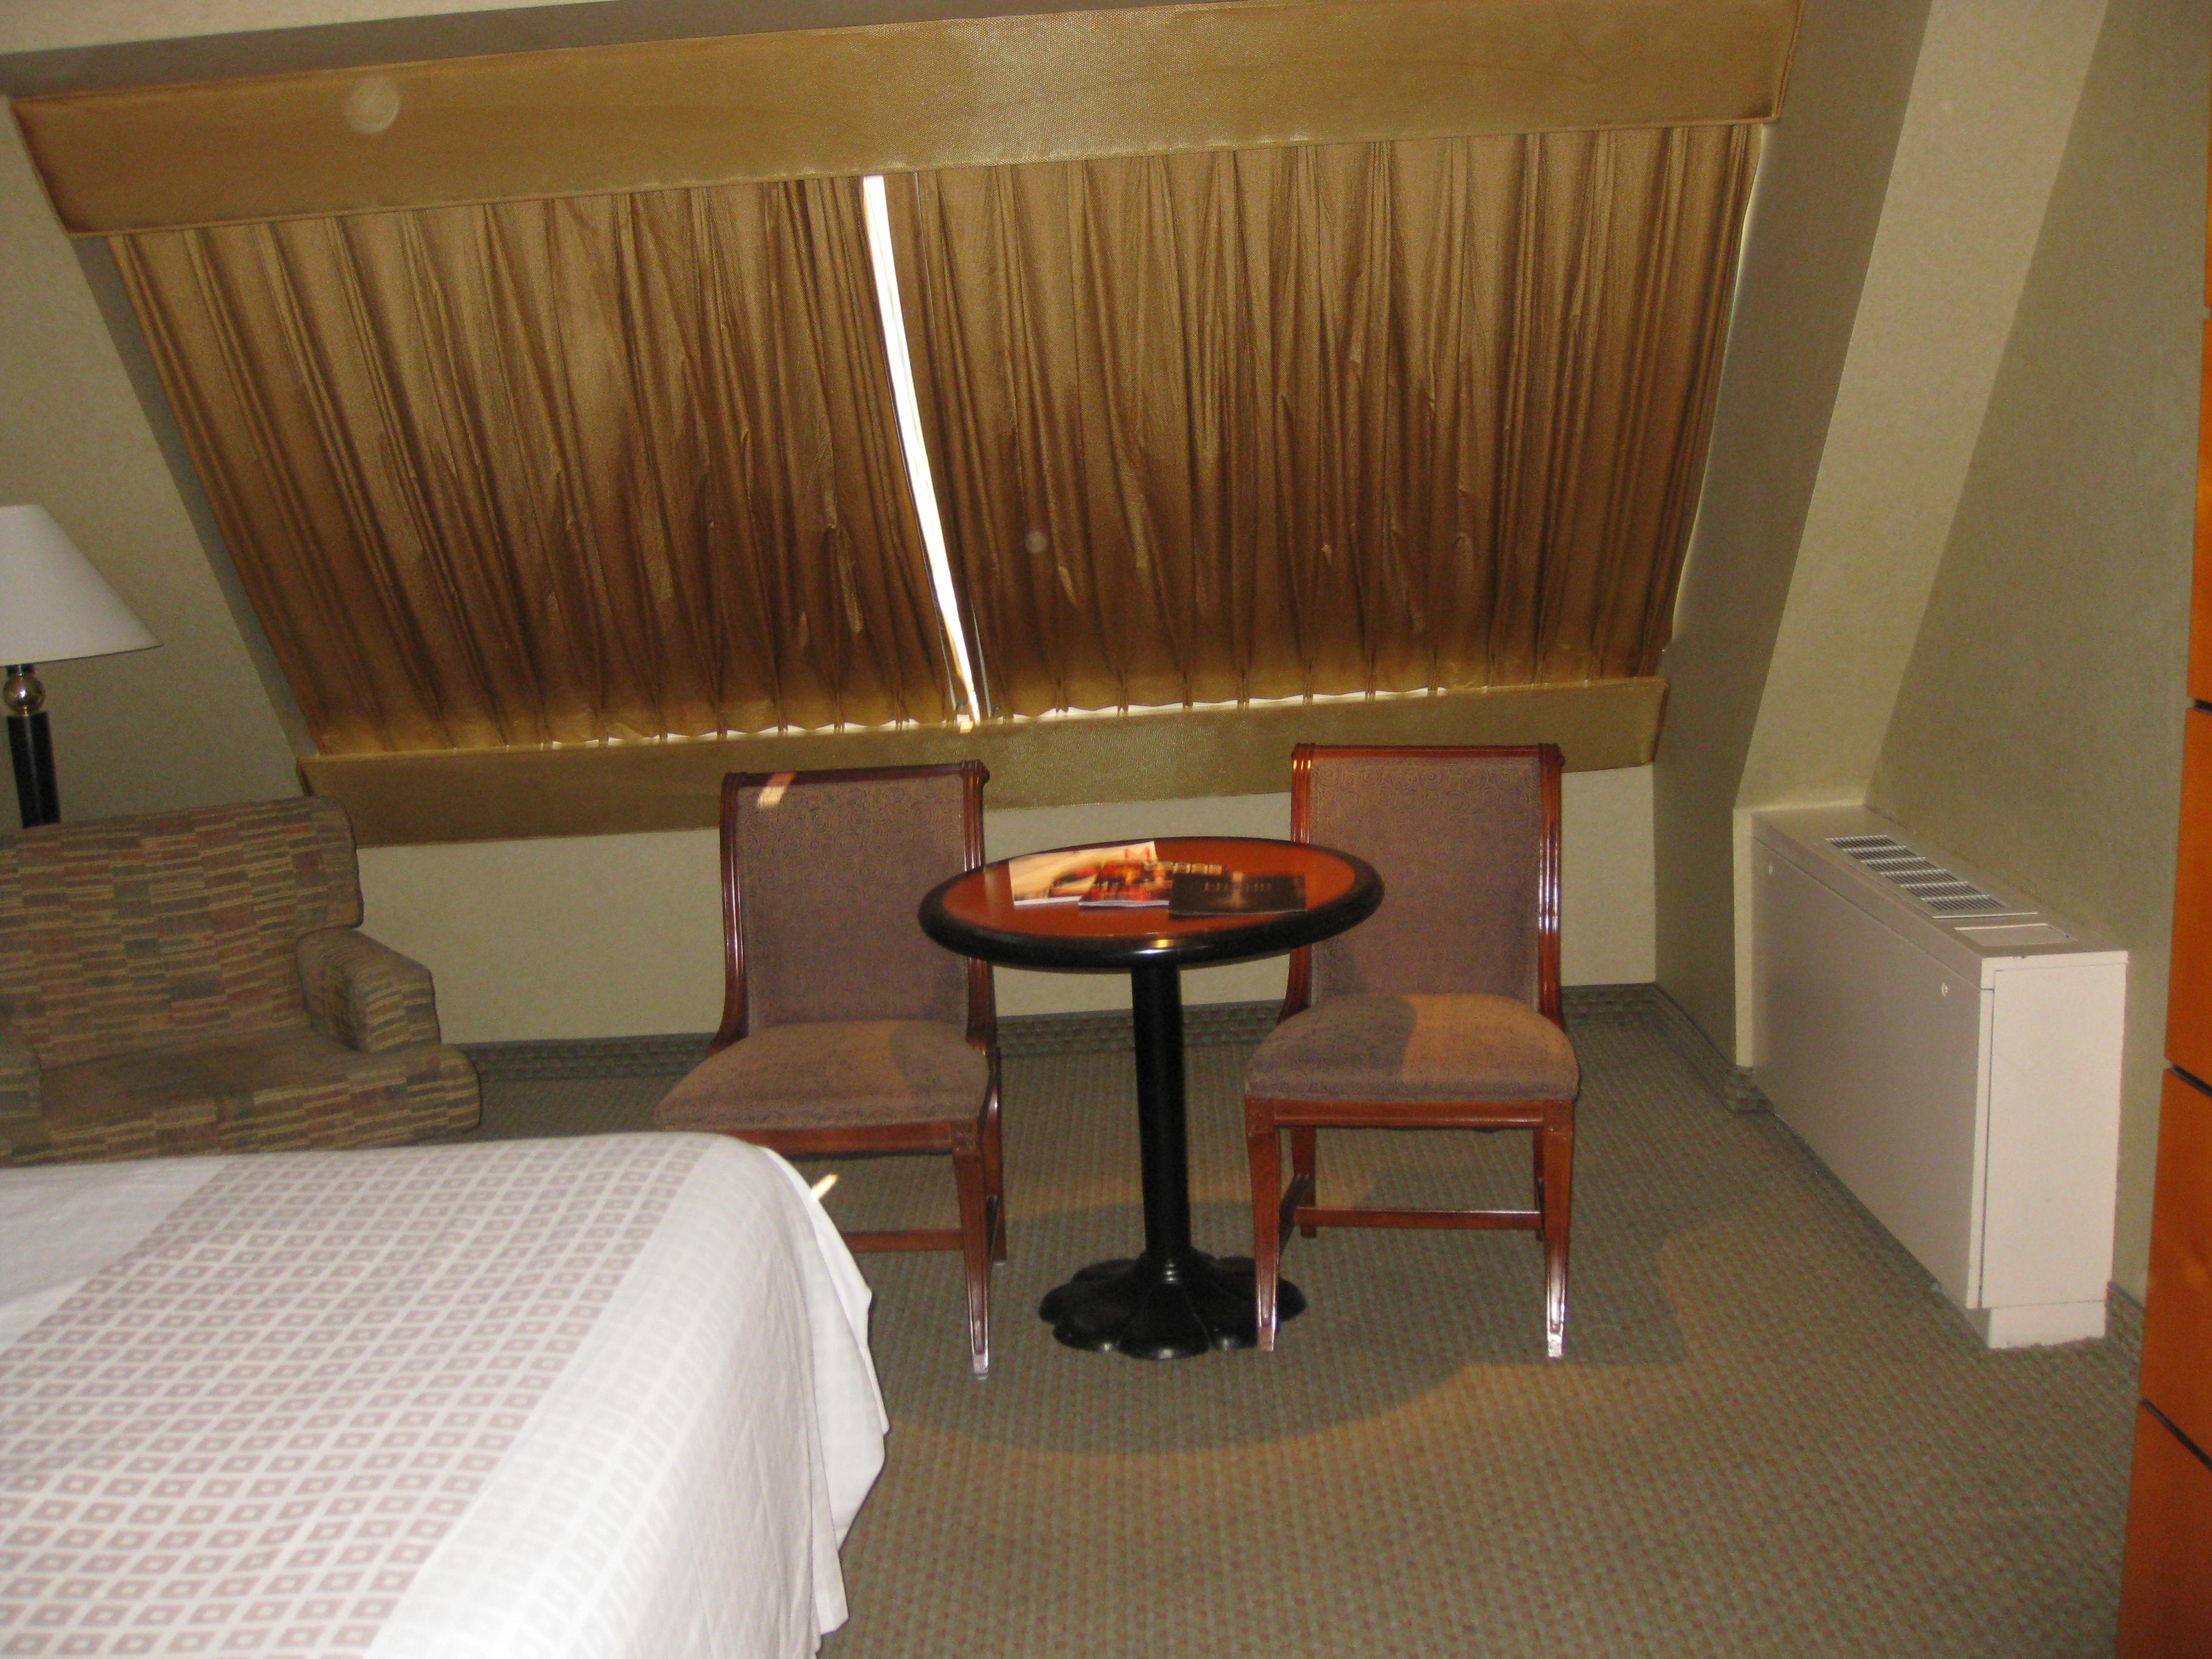 Luxor Hotel Room Service